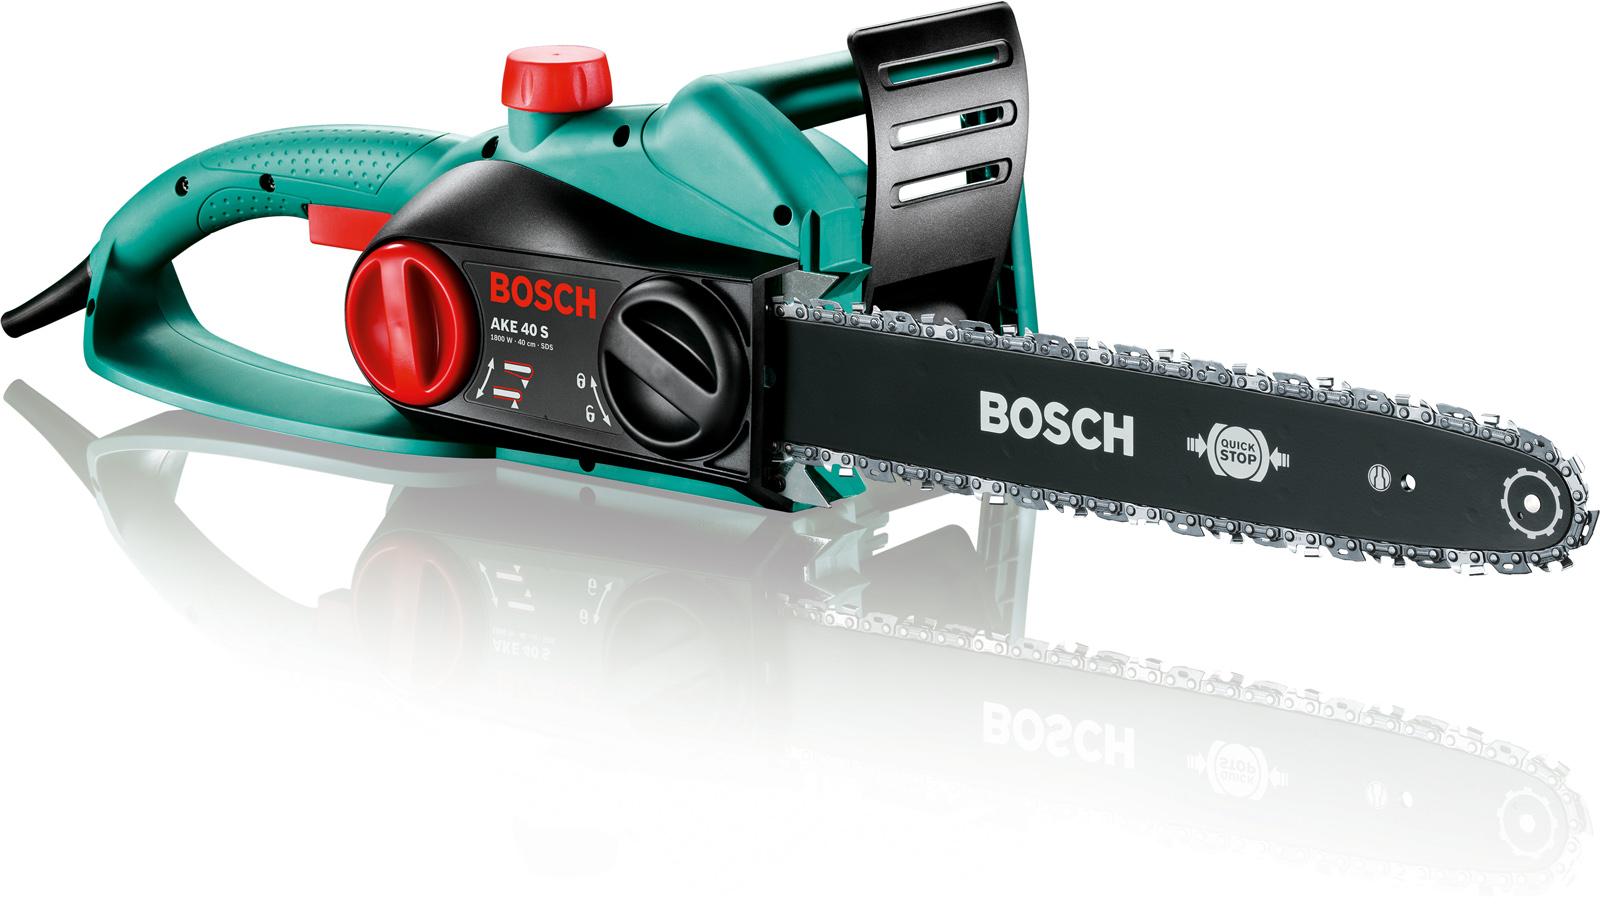 Пила цепная Bosch Ake 40 s (0.600.834.600) цепь для пилы bosch ake 30 17 8s и 30 li